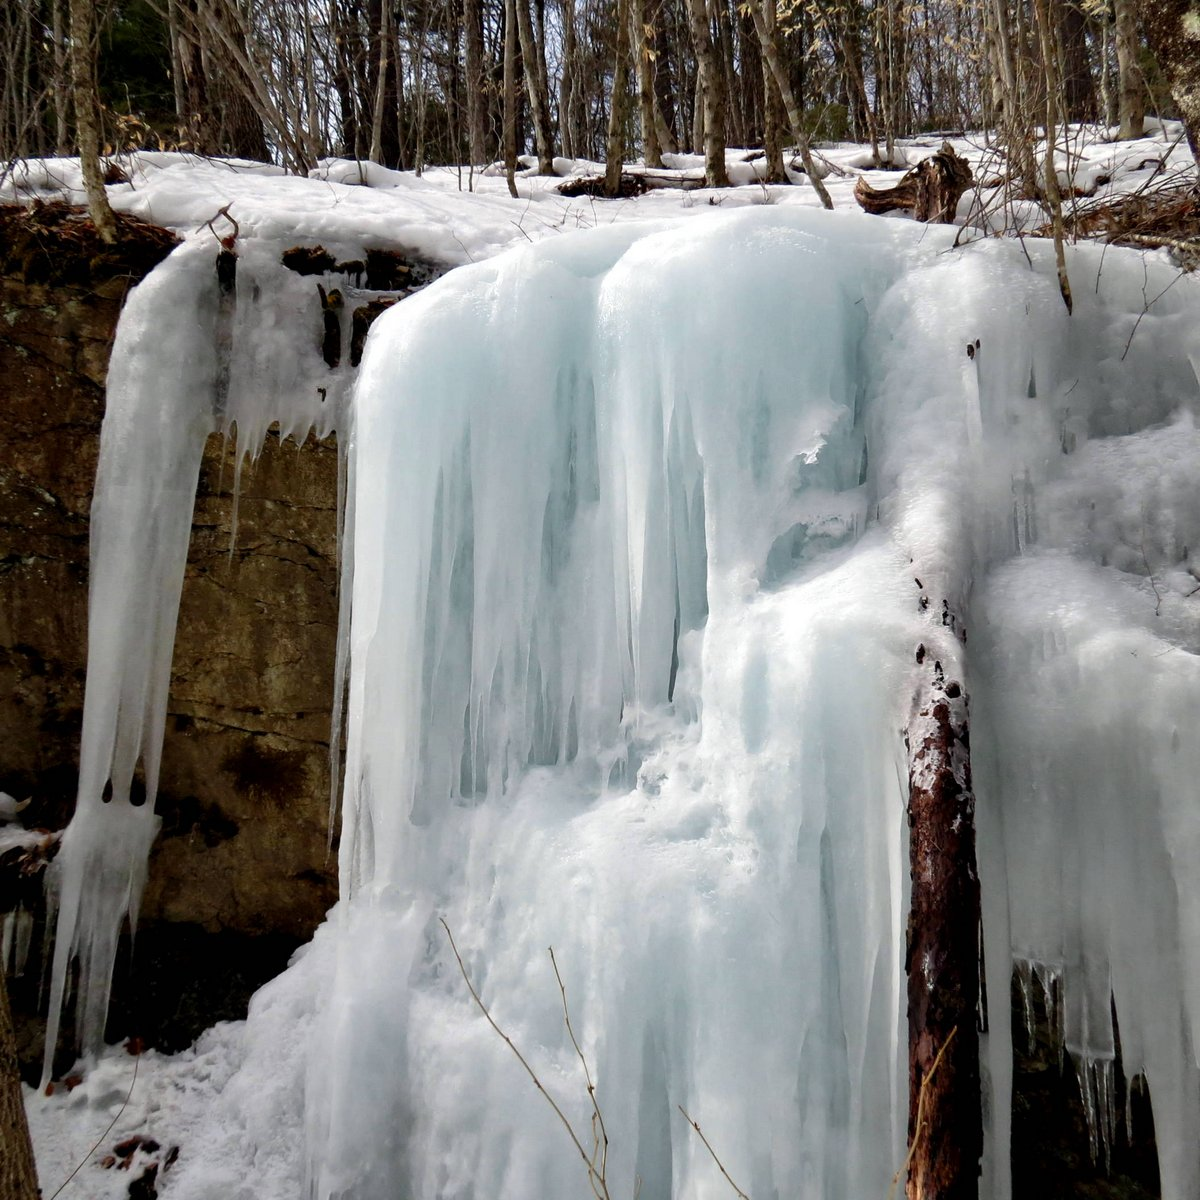 6. Ledge Ice